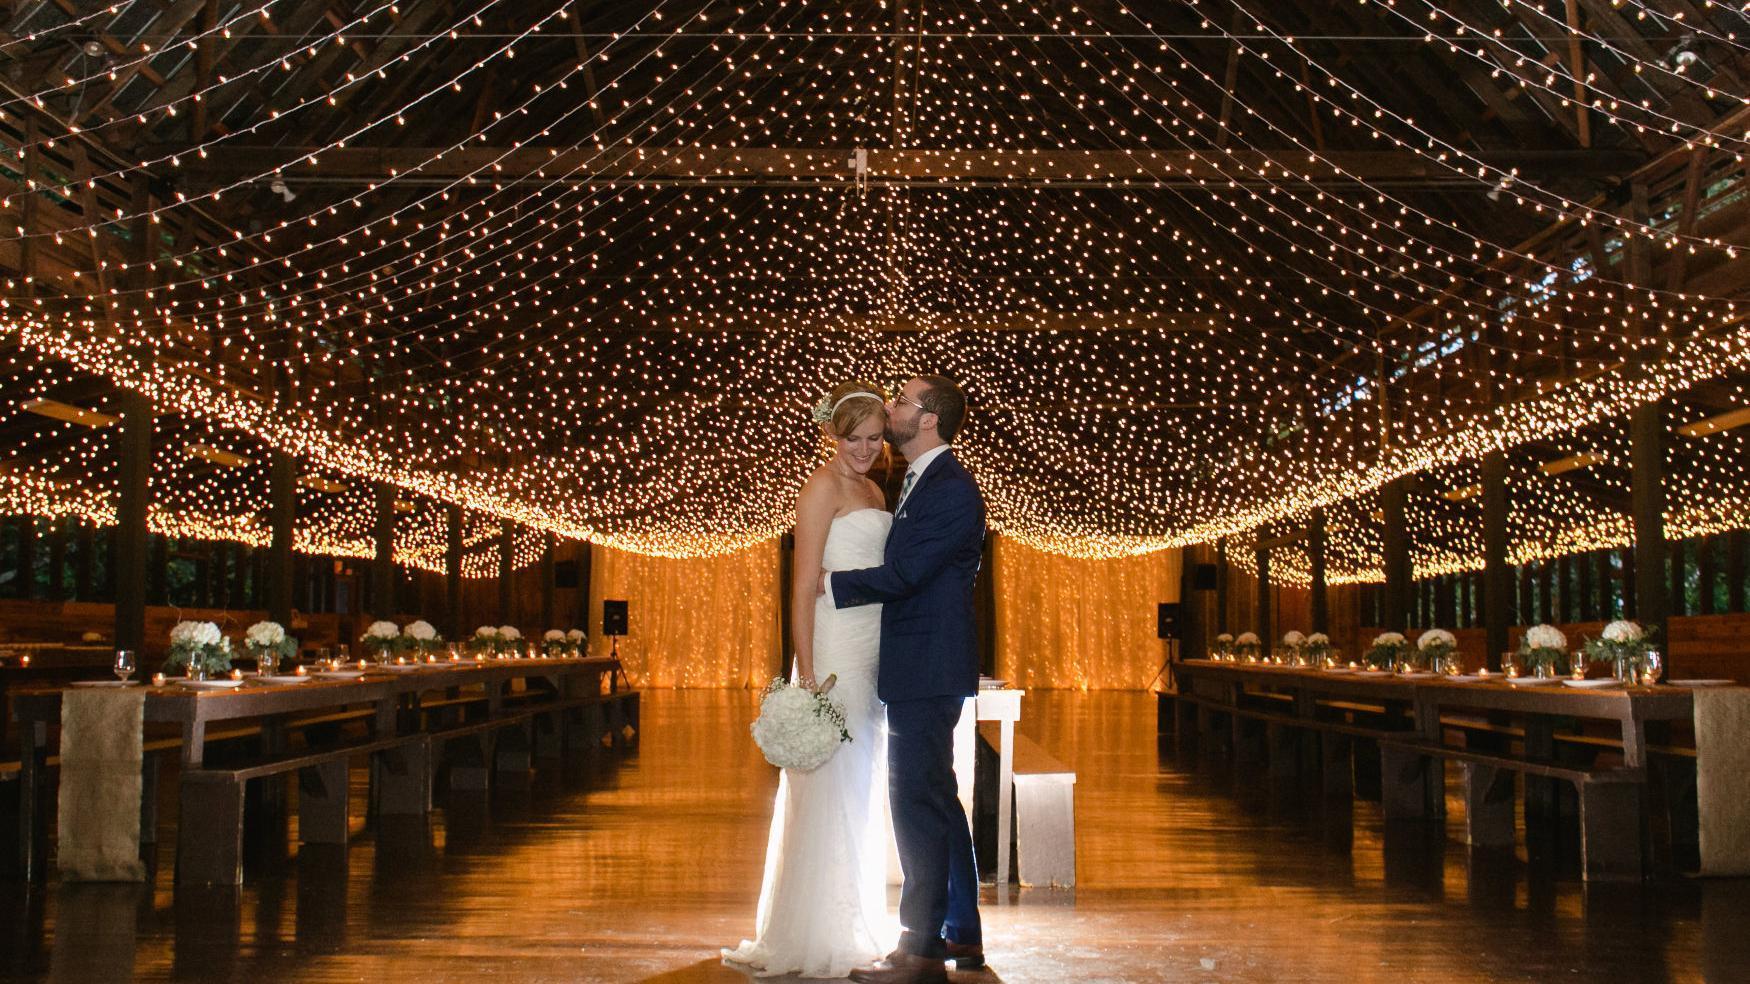 Summer camp weddings   Recreation   herald review.com